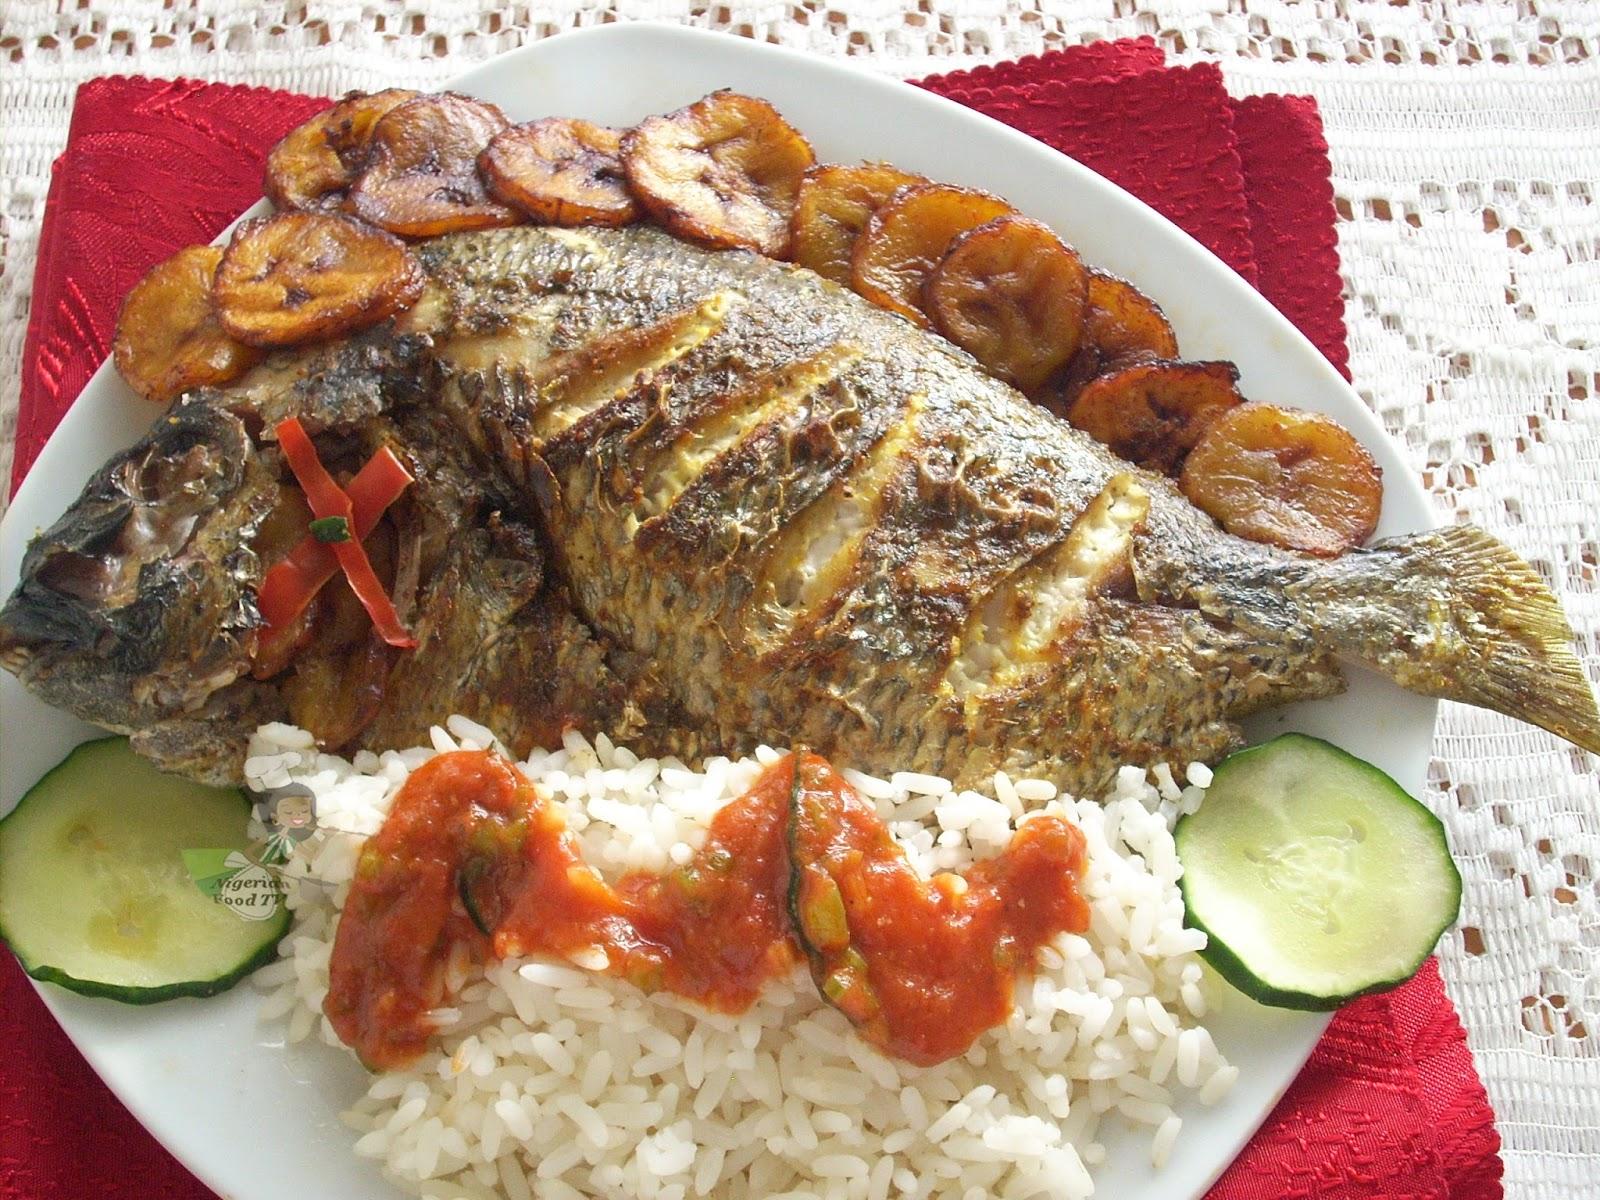 Nigerian food - medianet.info